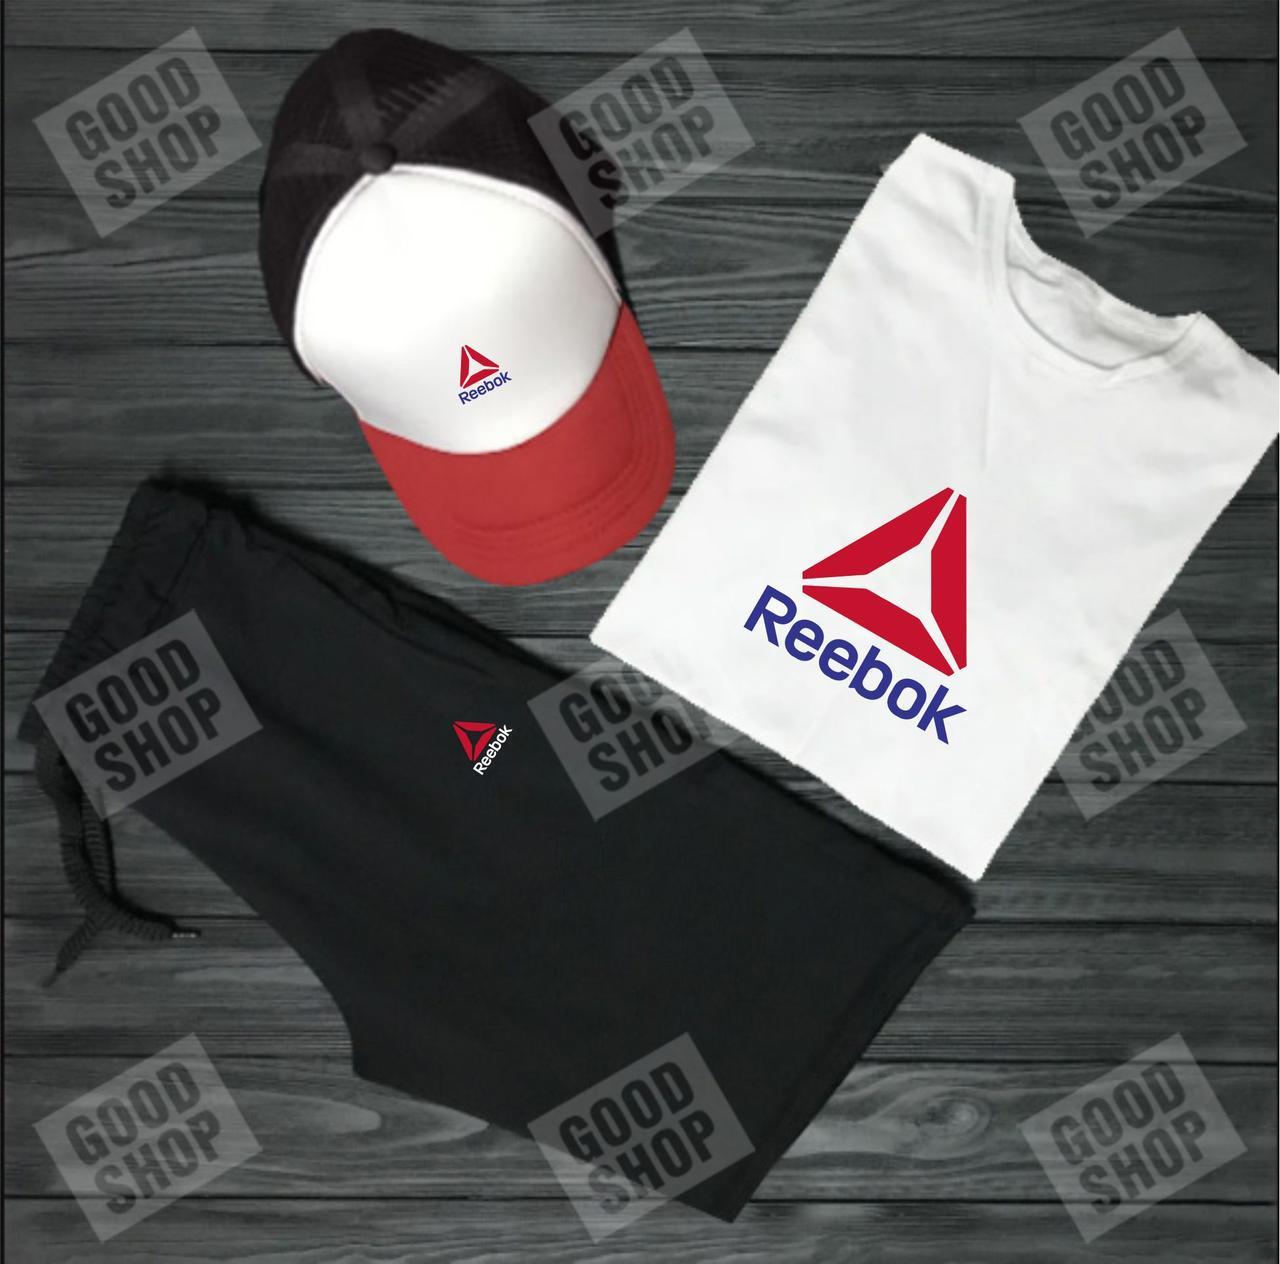 Мужской костюм тройка кепка футболка и шорты Рибок (Reebok), летний мужской костюм, копия